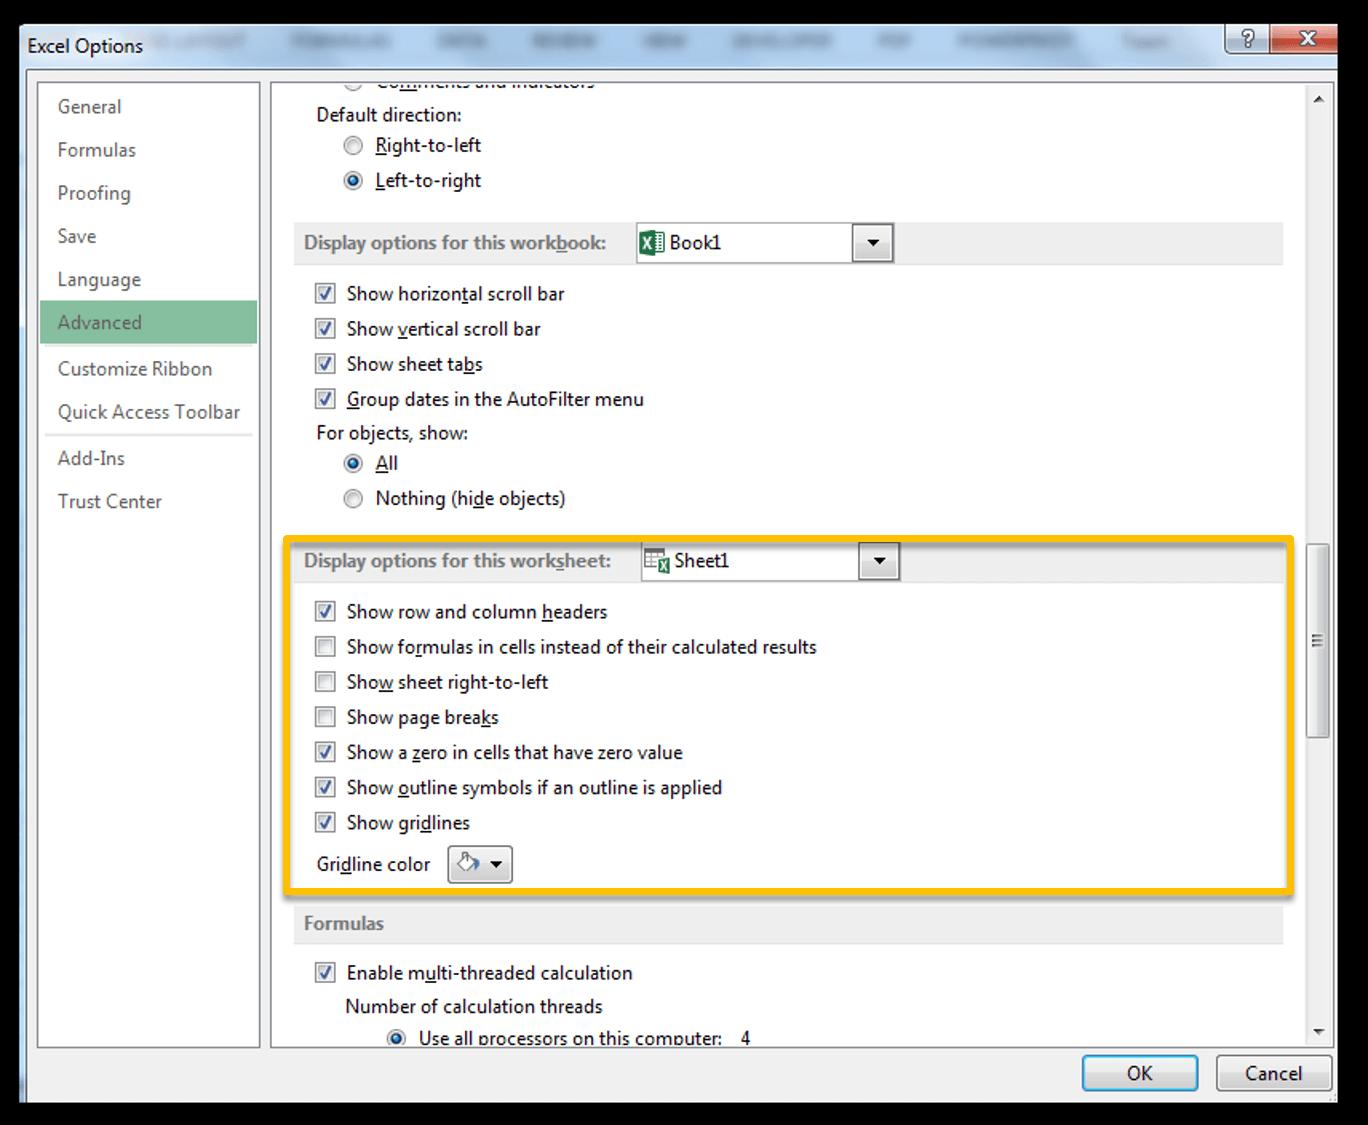 Change grid line colors in Excel - Image 3